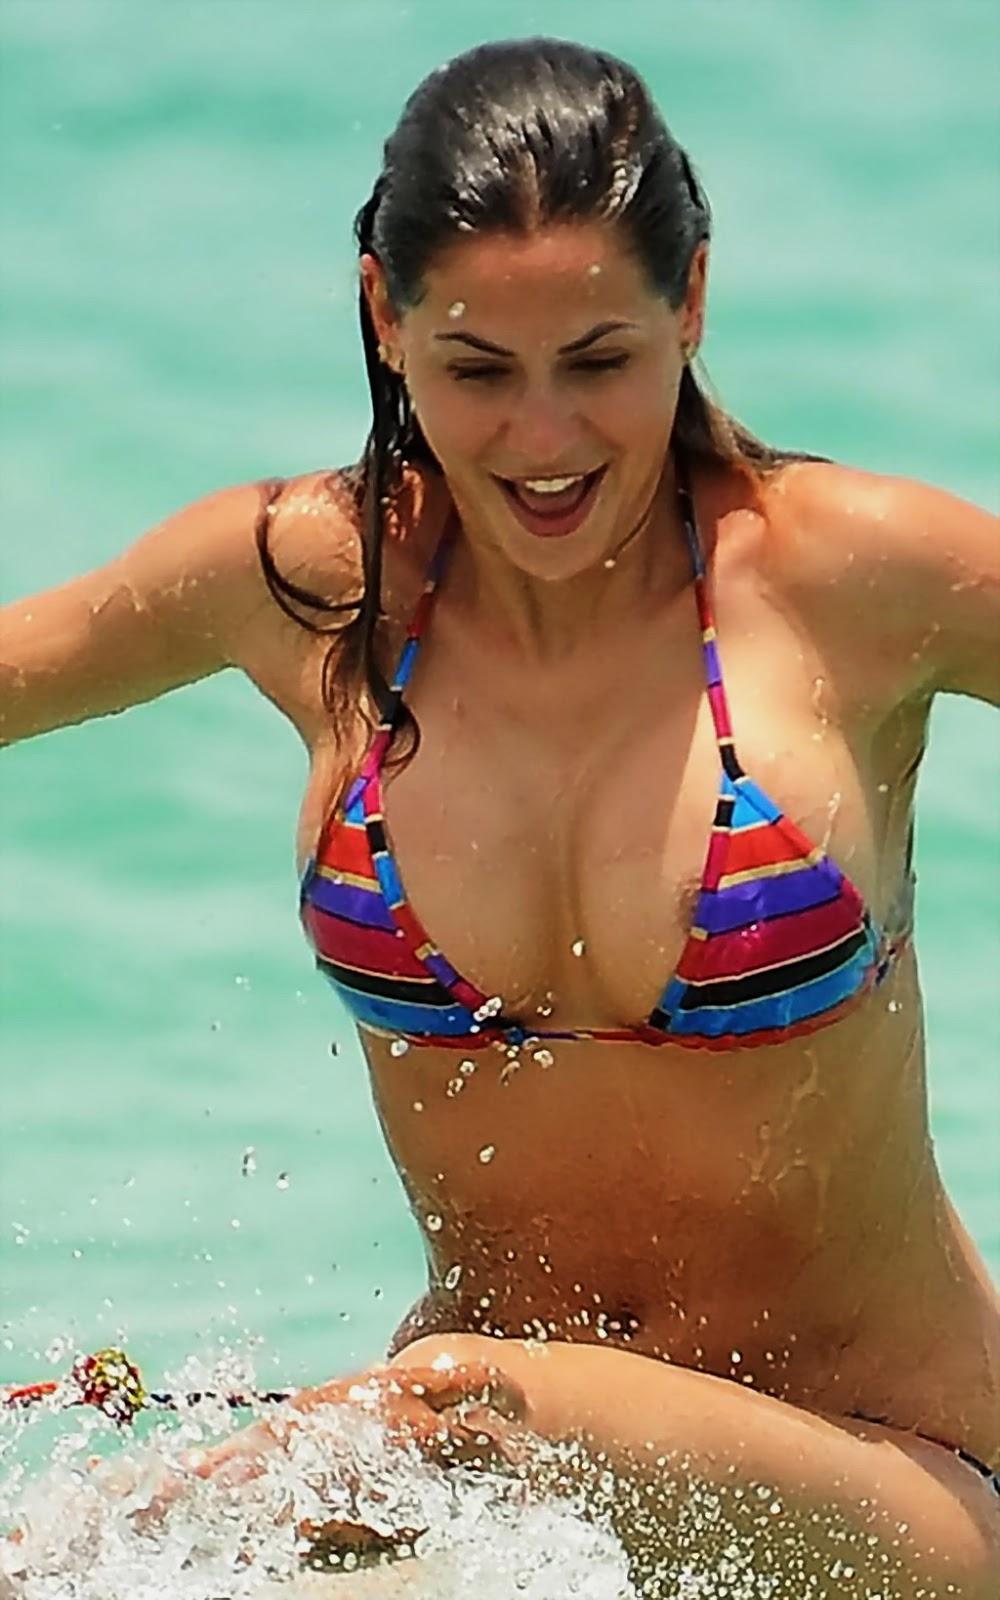 Melissa Satta Bikini Bottom Gets Snagged